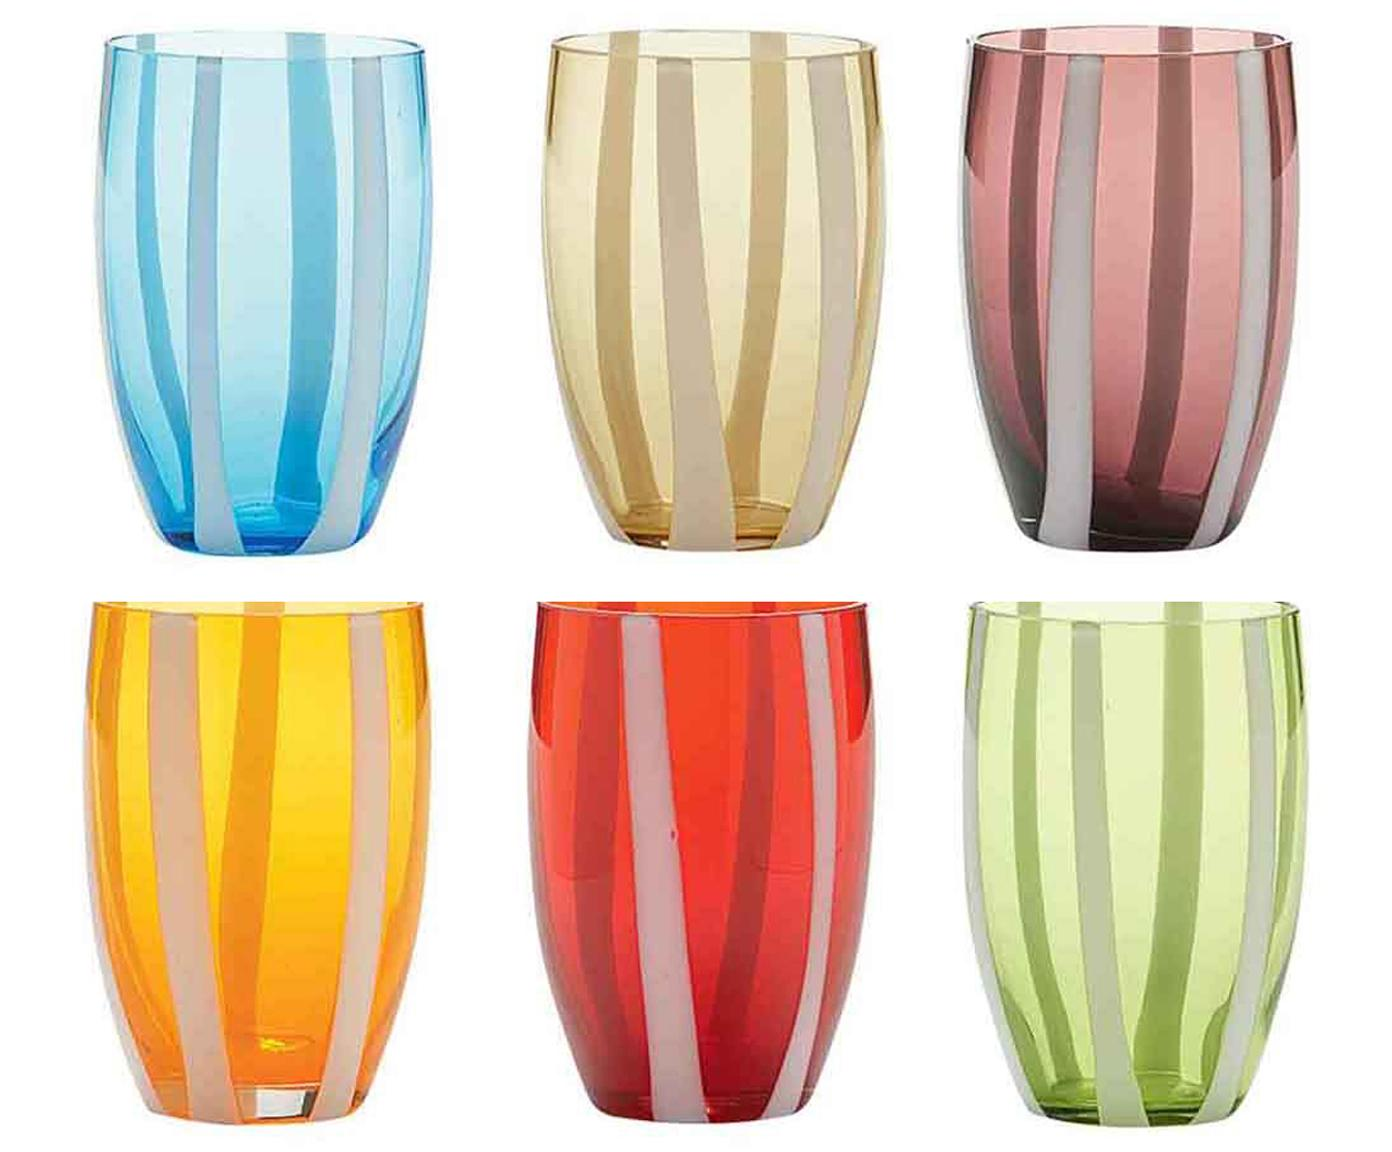 Vasos de vidrio soplado Gessato, 6uds., Vidrio, Blanco, azul, ámbar, violeta pastel, naranja, rojo, verde, Ø 7 x Al 11 cm